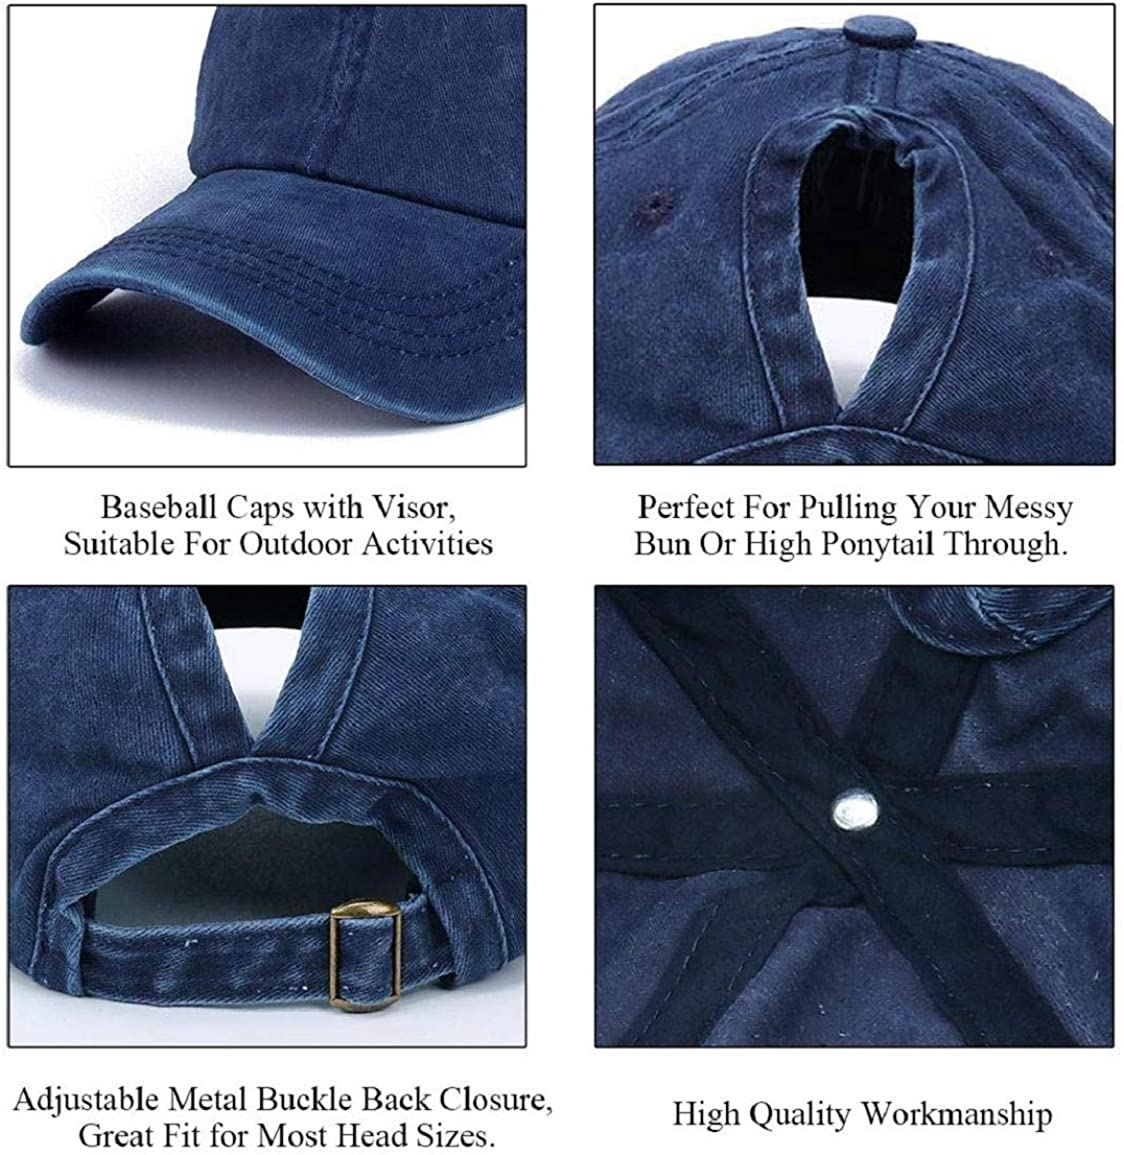 Voqeen Ponytail Baseball Hat Cap Unisex Washed Trucker Hat Cap Adjustable Spring Autumn Solid Color Baseball Cap Ourdoor Sun Visor PonyCaps